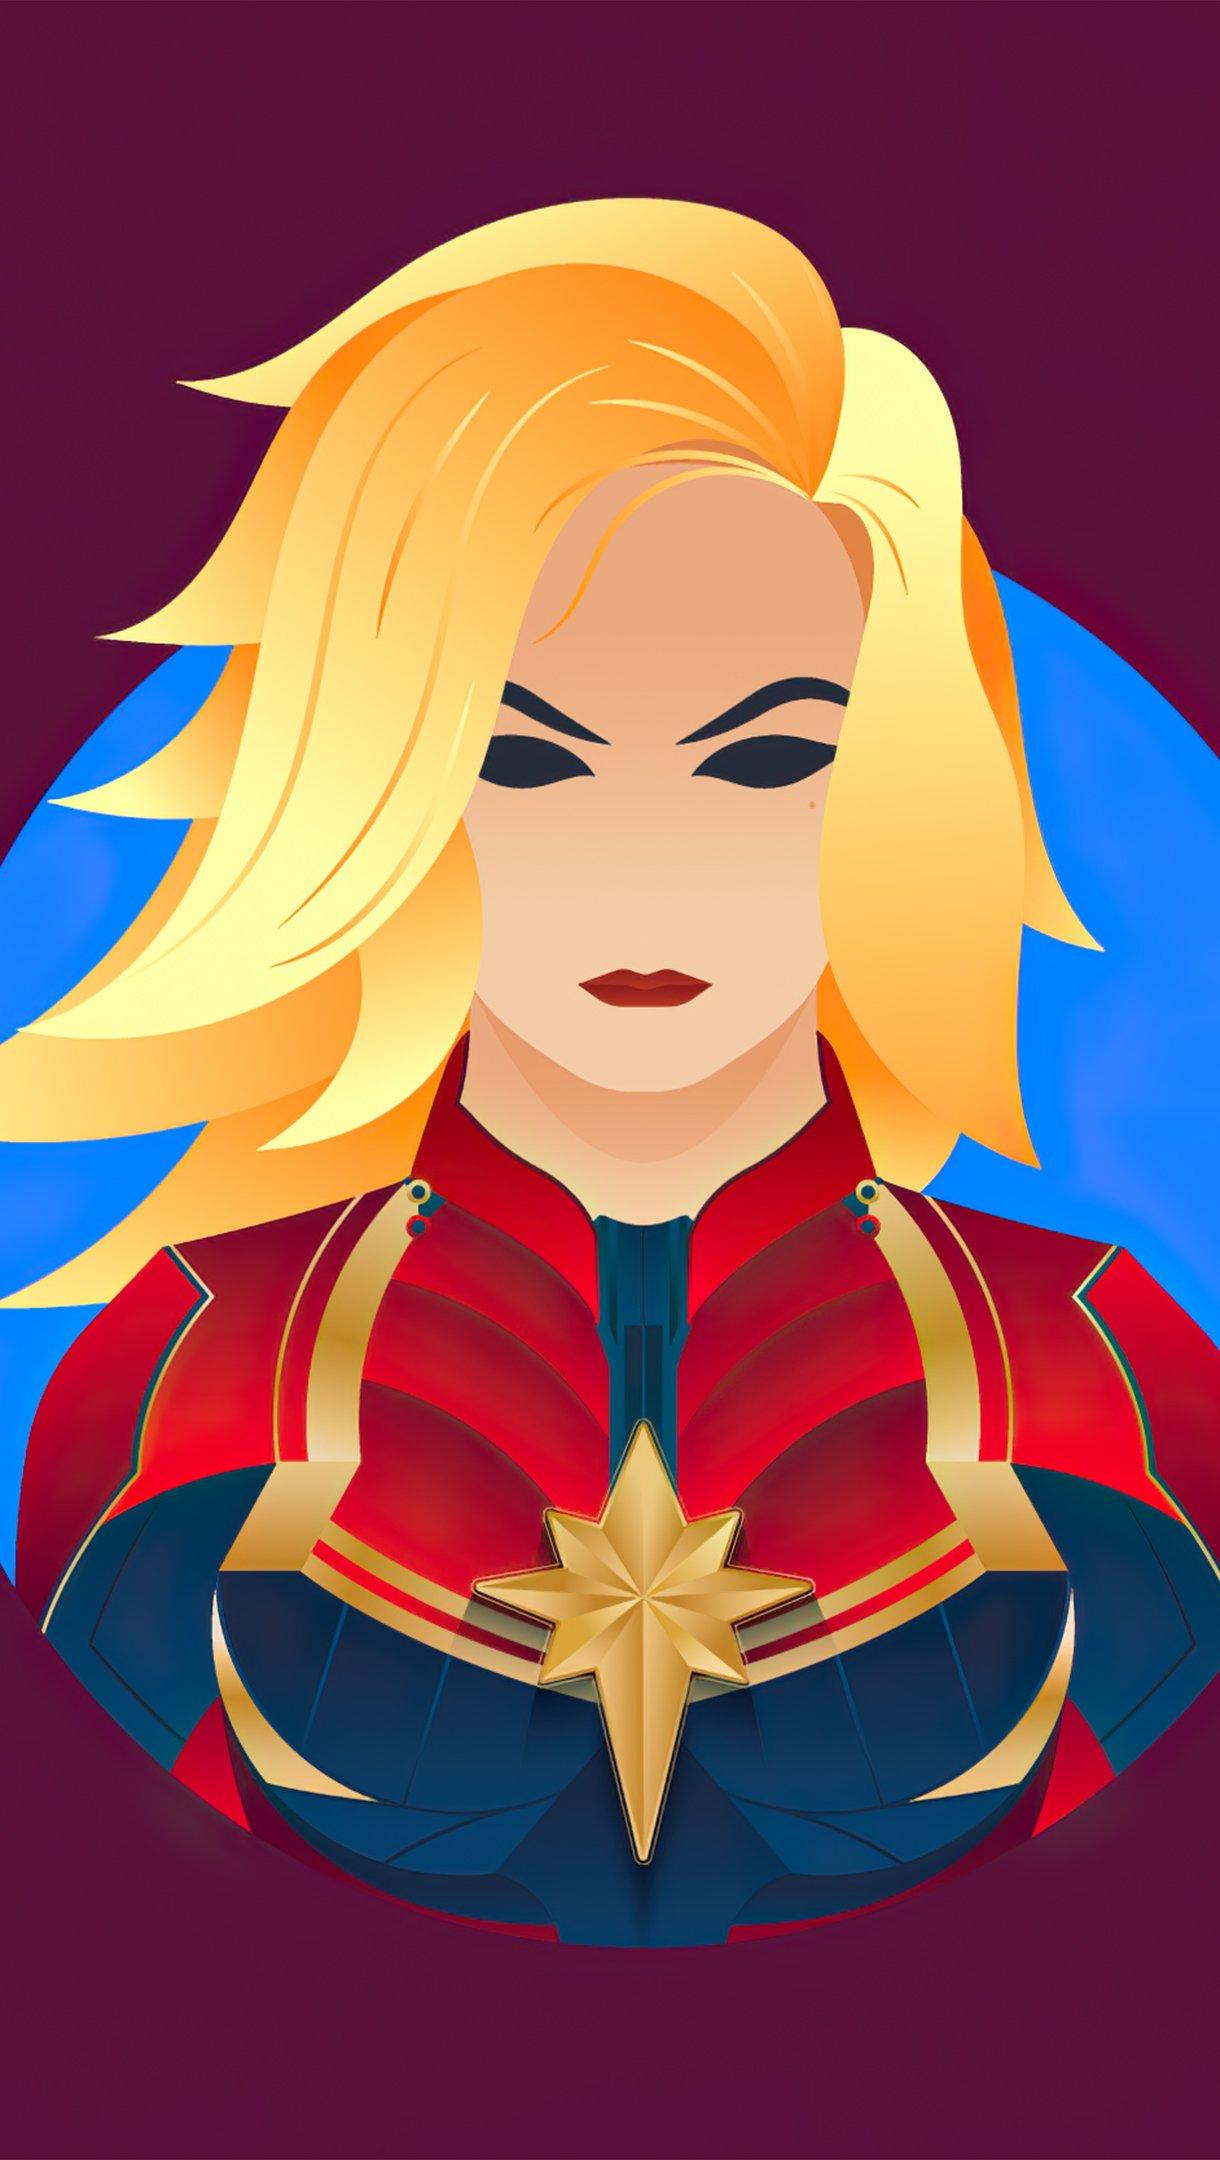 Fondos de pantalla Ilustración minimalista de Capitana Marvel Vertical